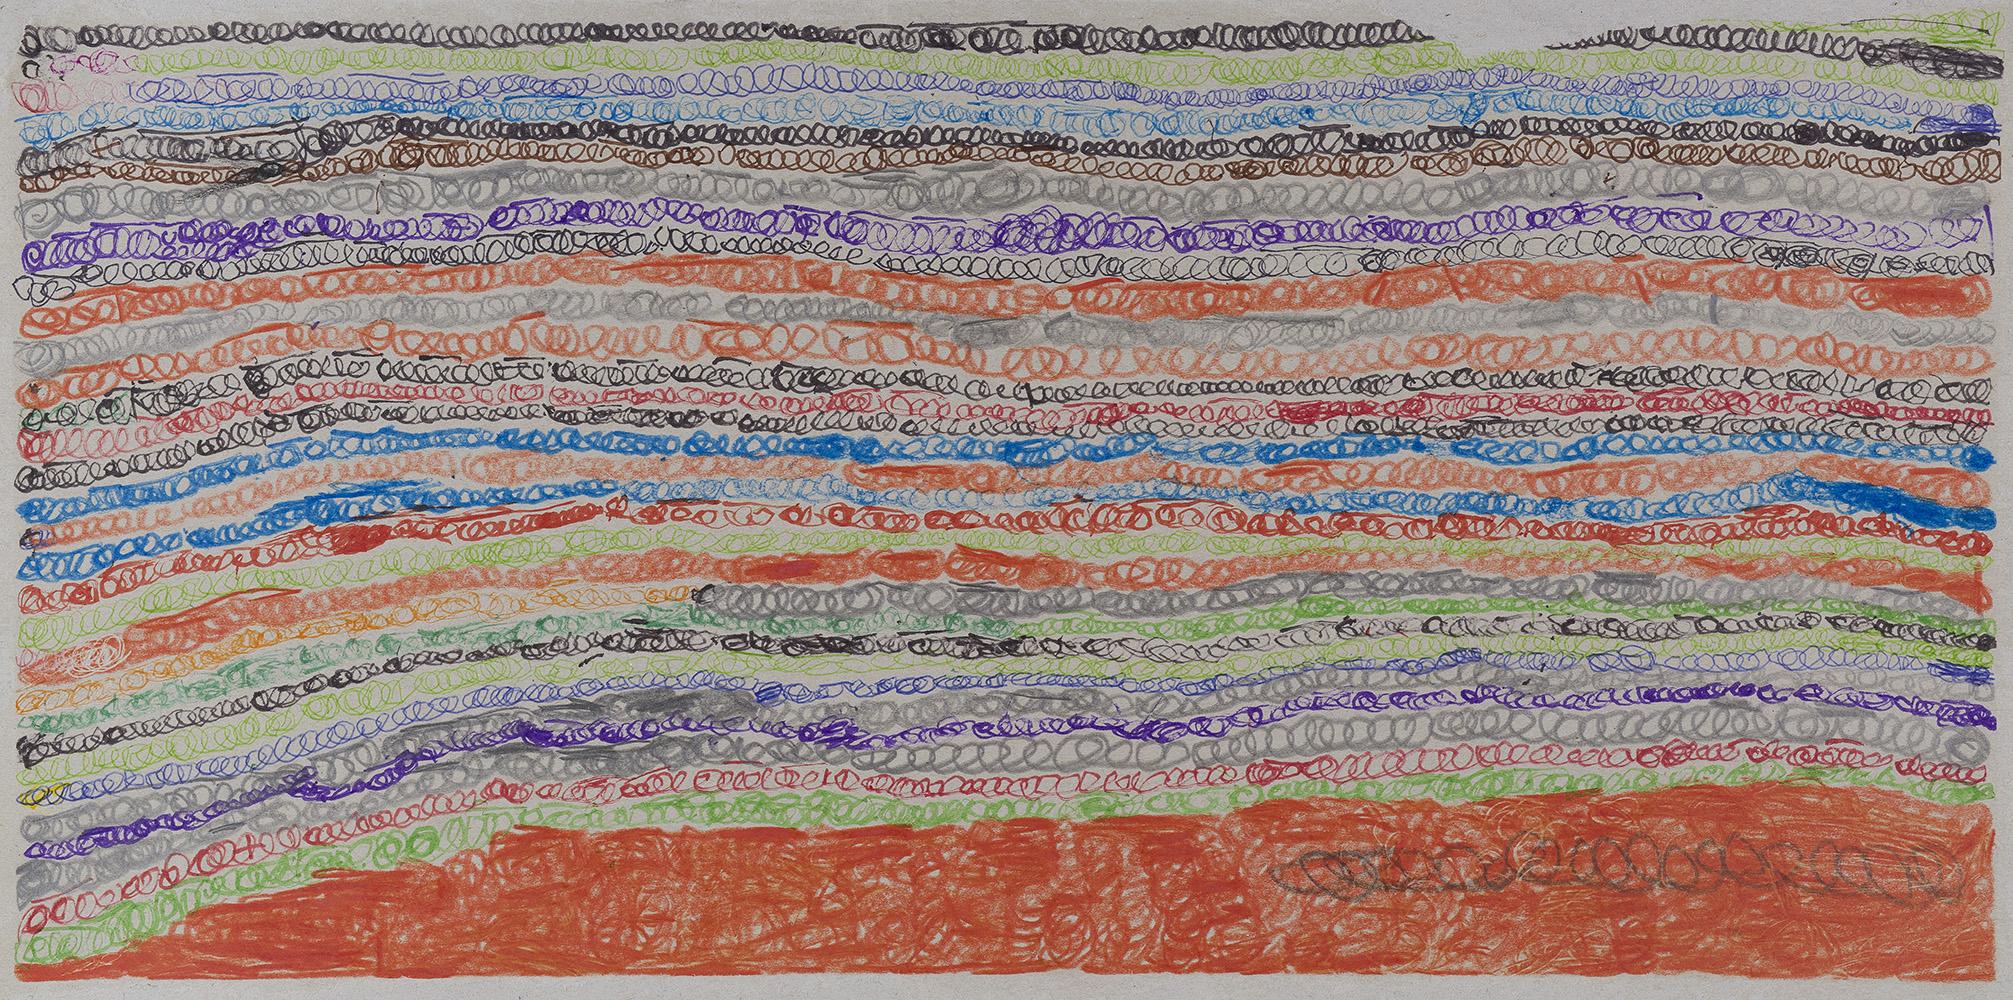 Joseph Lambert    Untitled  , 2014 Mixed media on paper 10.12 x 20.24 inches 25.7 x 51.4 cm JLam 10